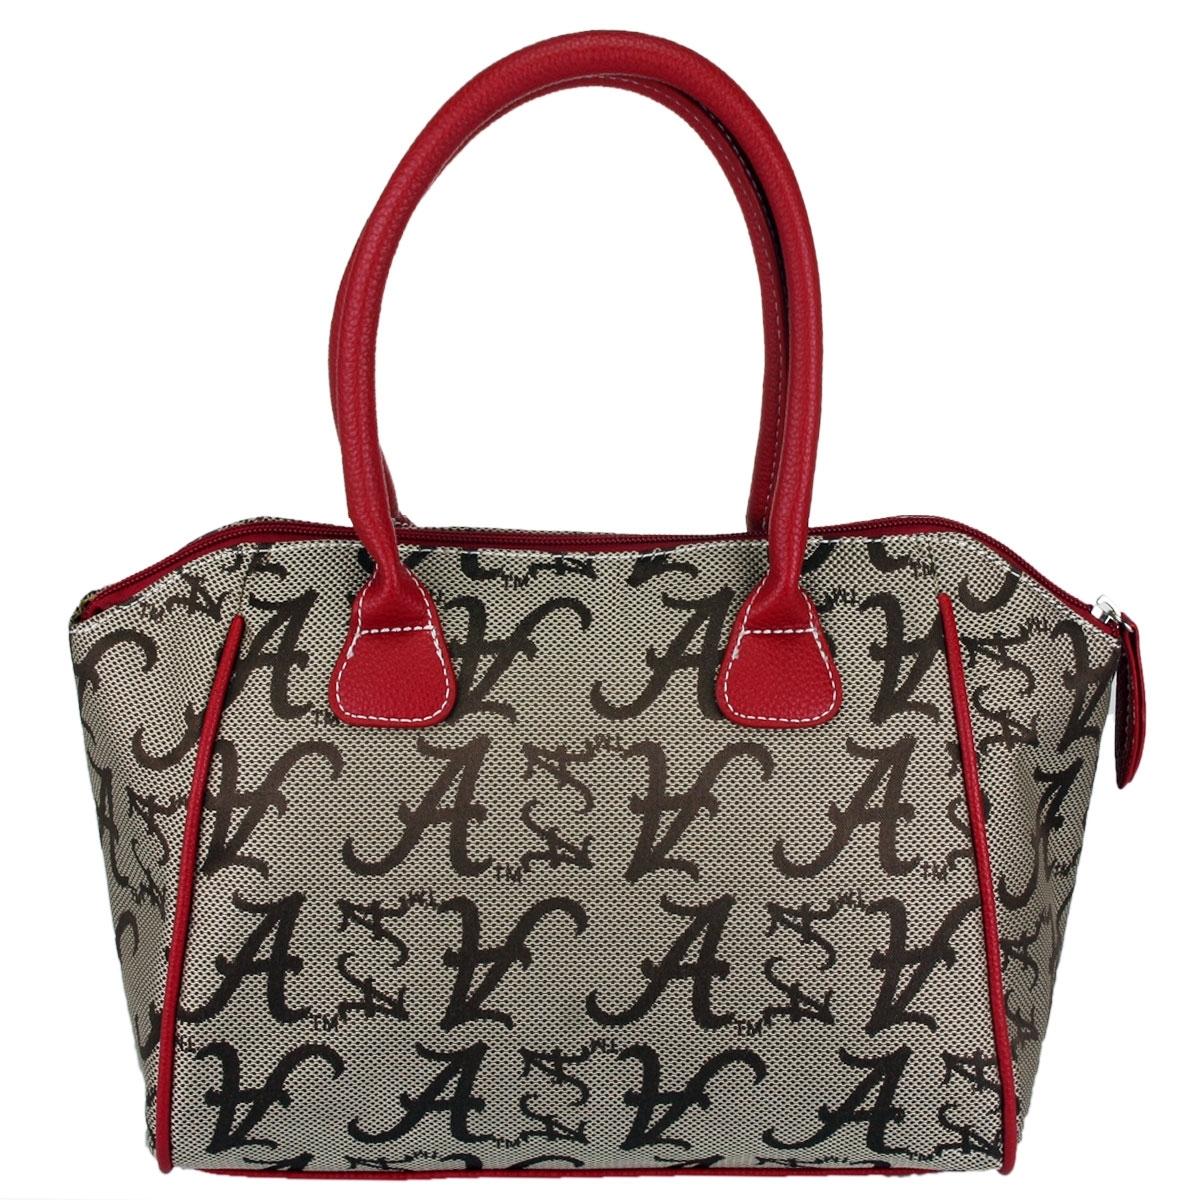 Alabama Crimson Tide The Empress Ncaa Lincensed Handbag for sale  USA